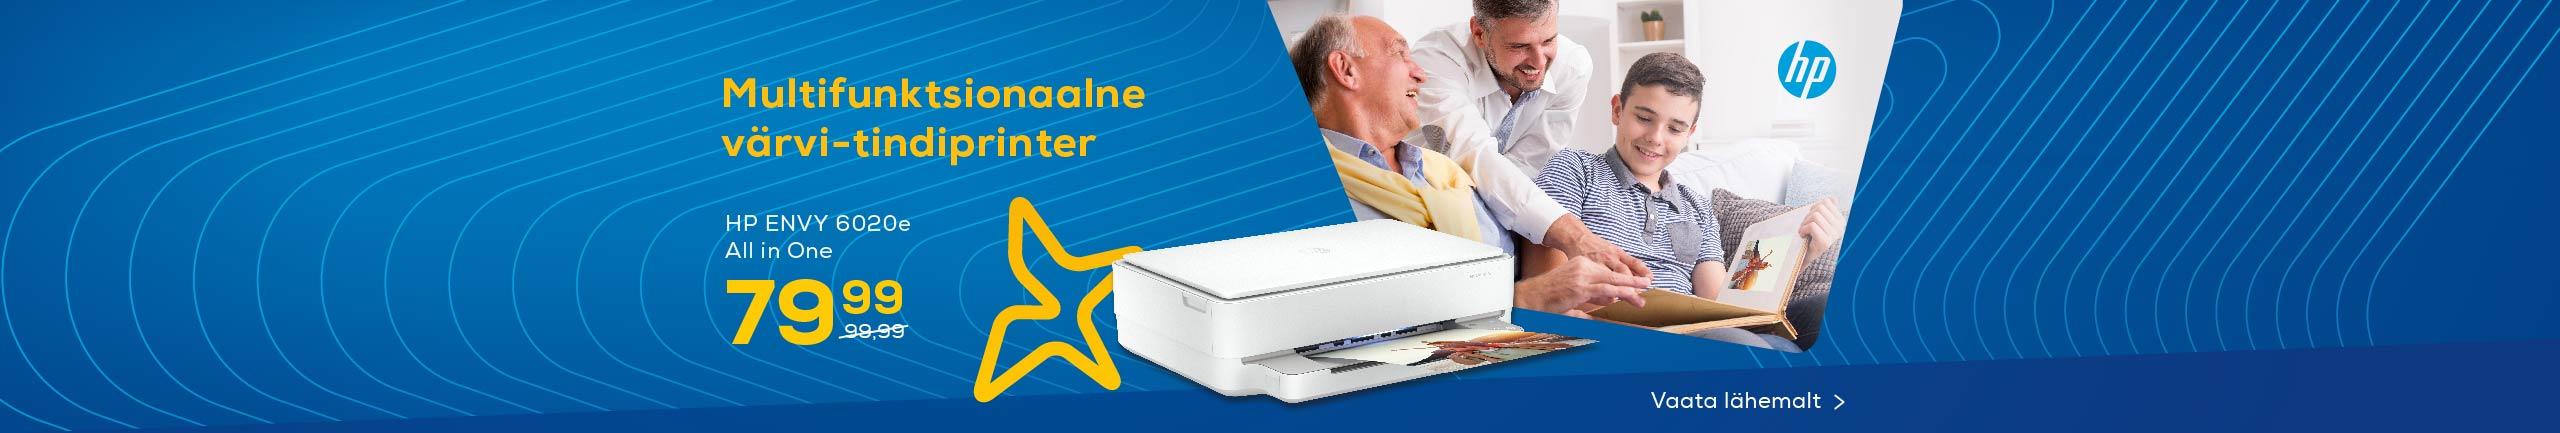 Multifunktsionaalne värvi- tindiprinter HP ENVY 6020e All in One